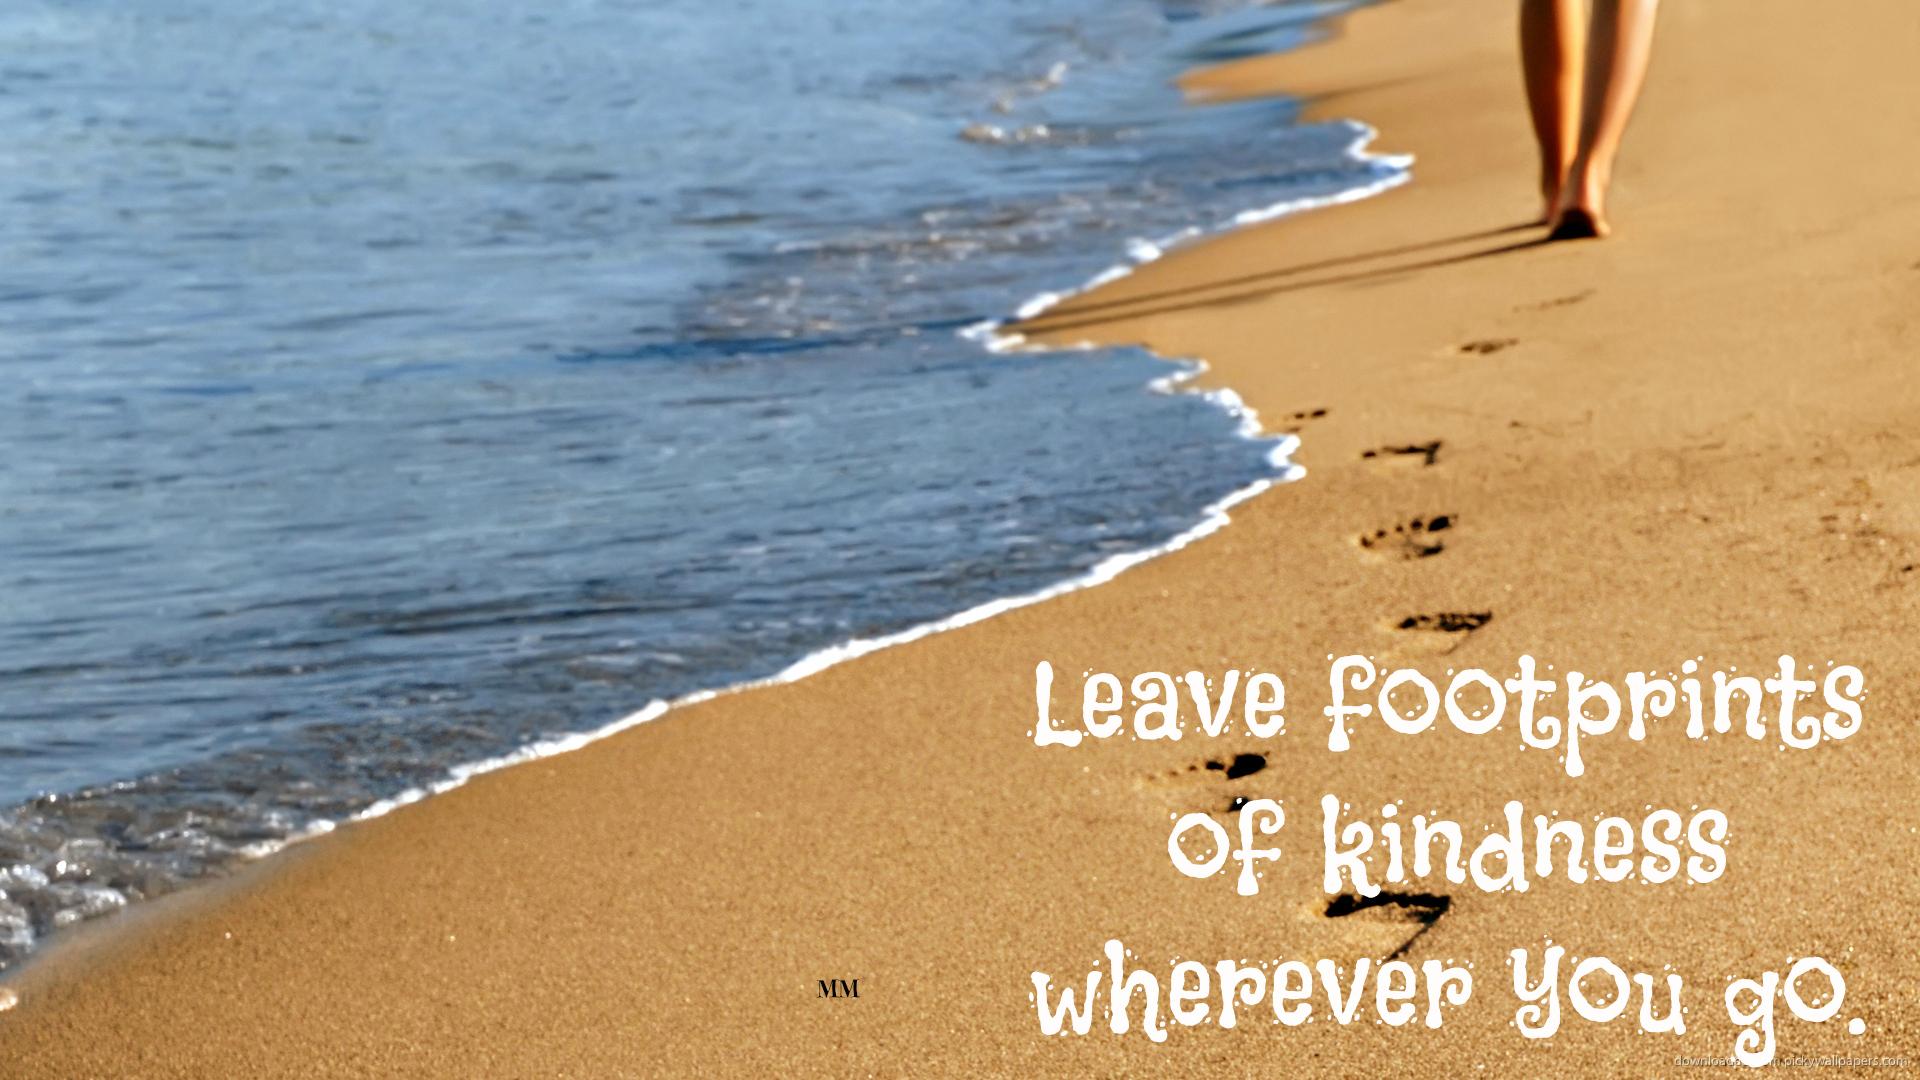 Beach Quotes Wallpaper: Footprint Beach Quotes. QuotesGram